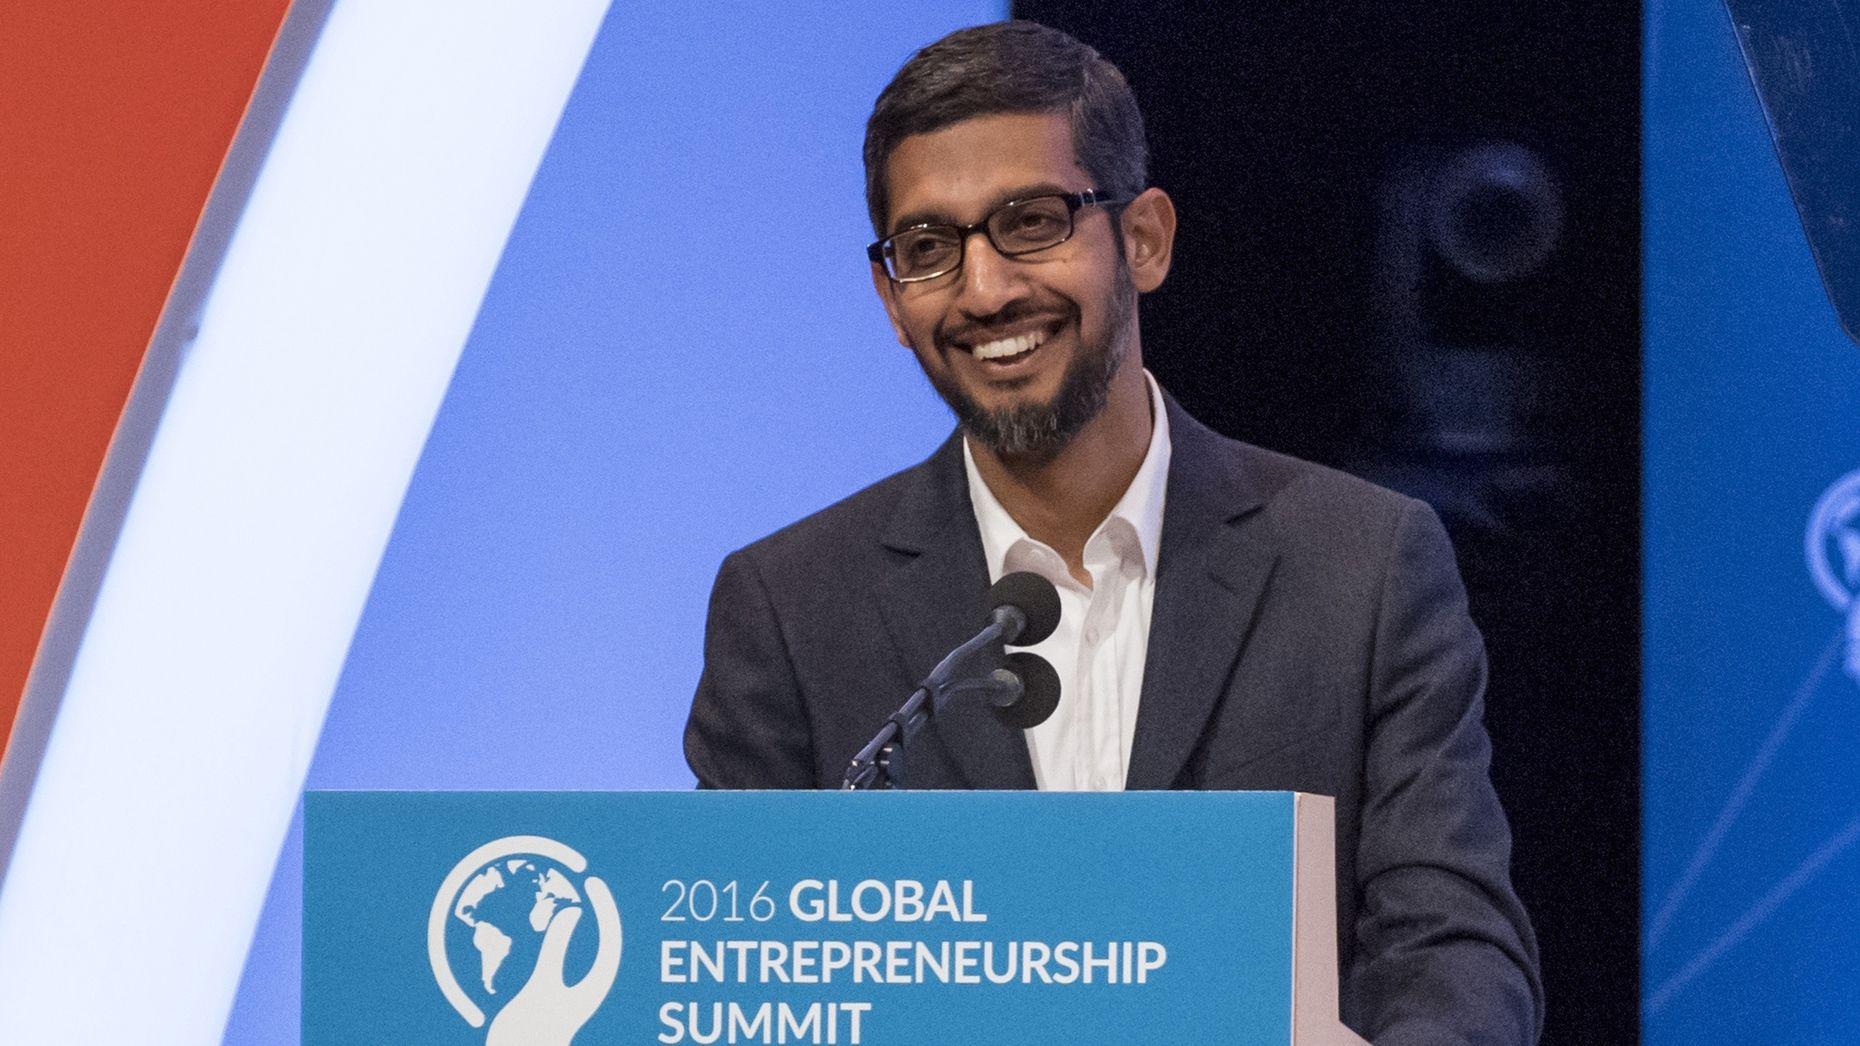 Google CEO Sundar Pichai. Photo by Bloomberg.